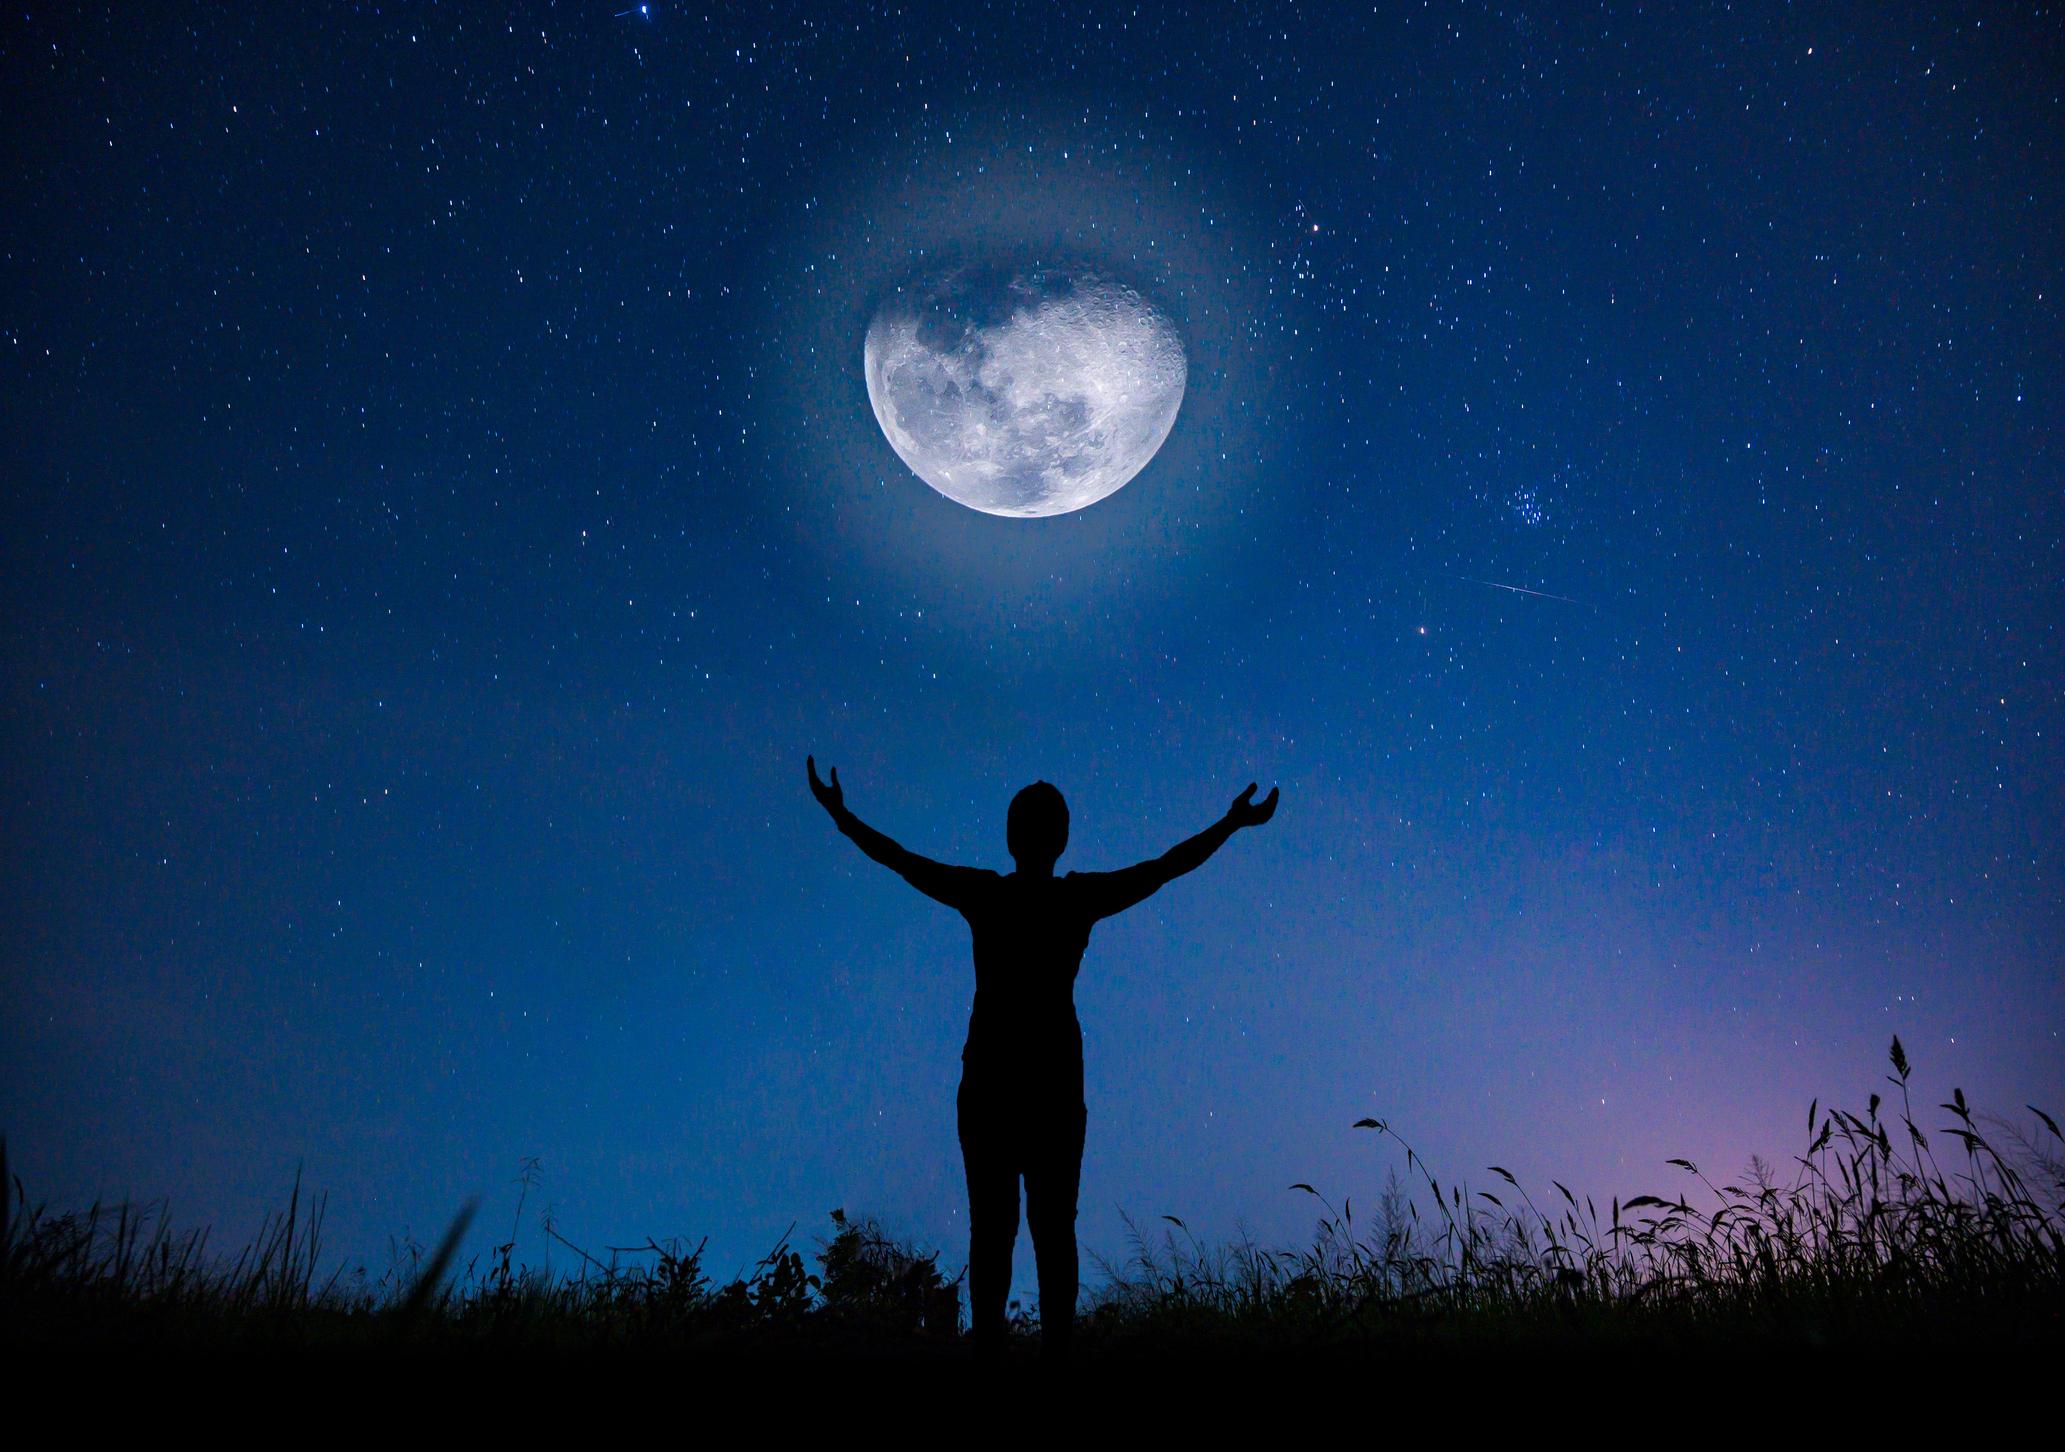 Weekly horoscope | Monday 25th May - Sunday 31st May